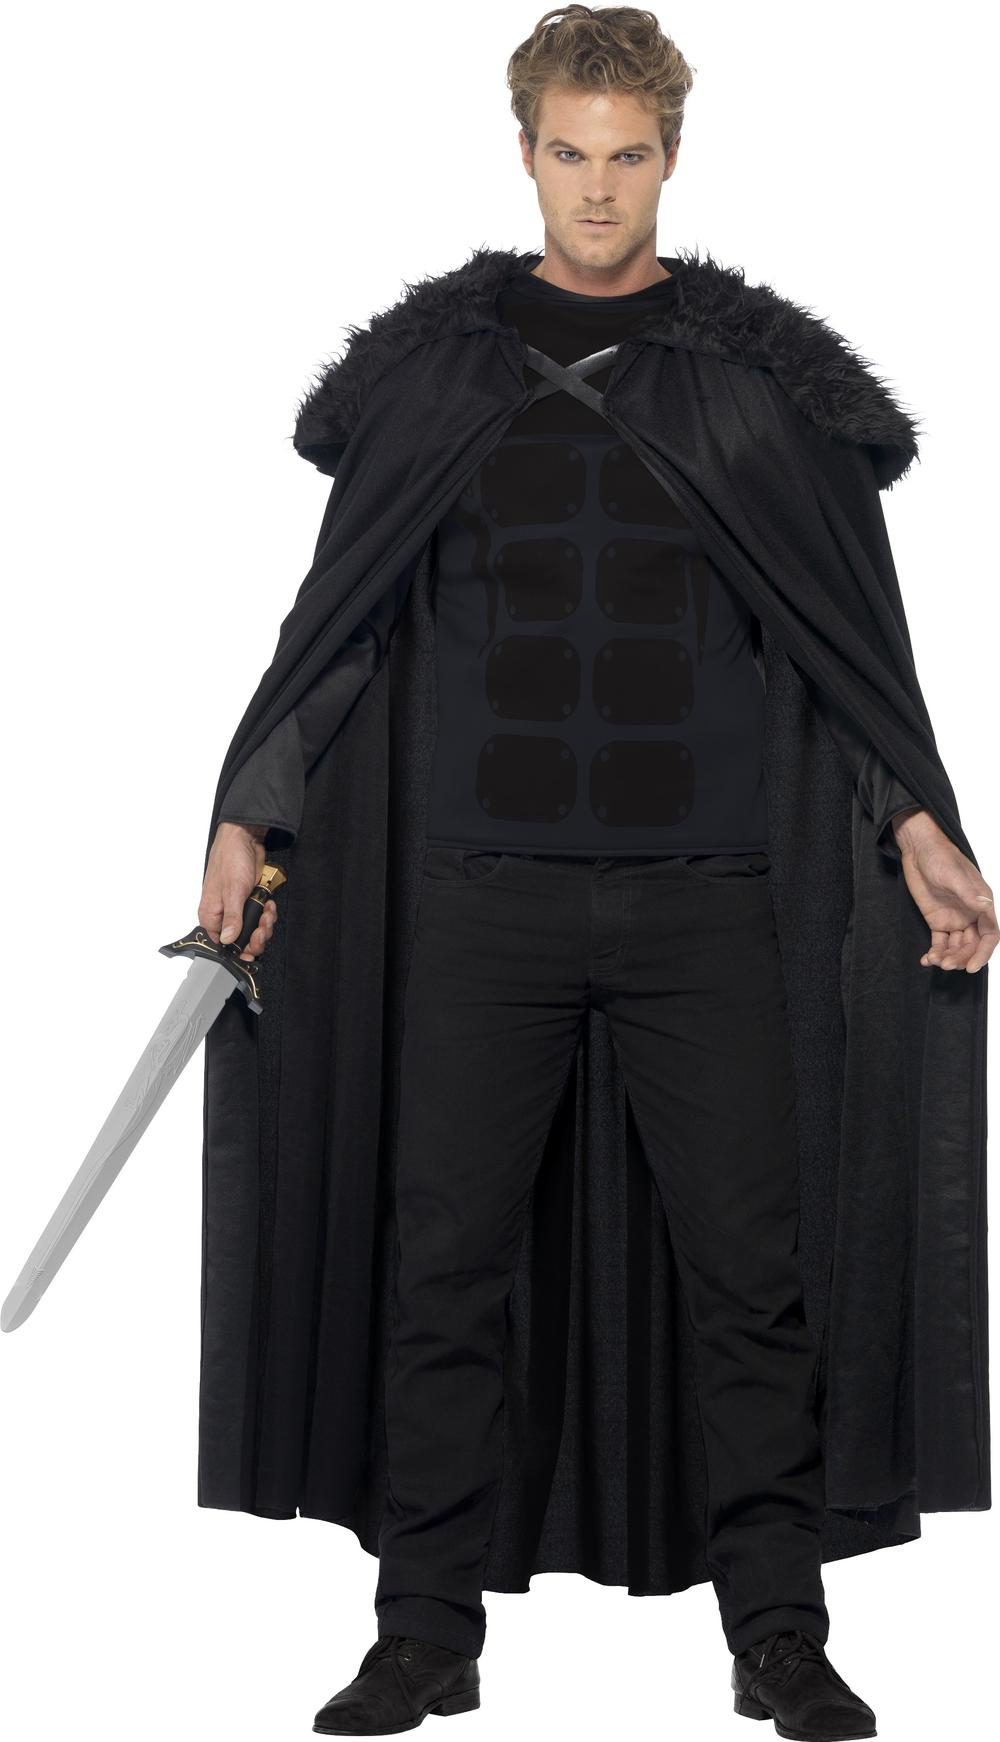 Dark Barbarian Jon Snow Game Of Thrones Mens Fancy Dress Adults Medievel Costume